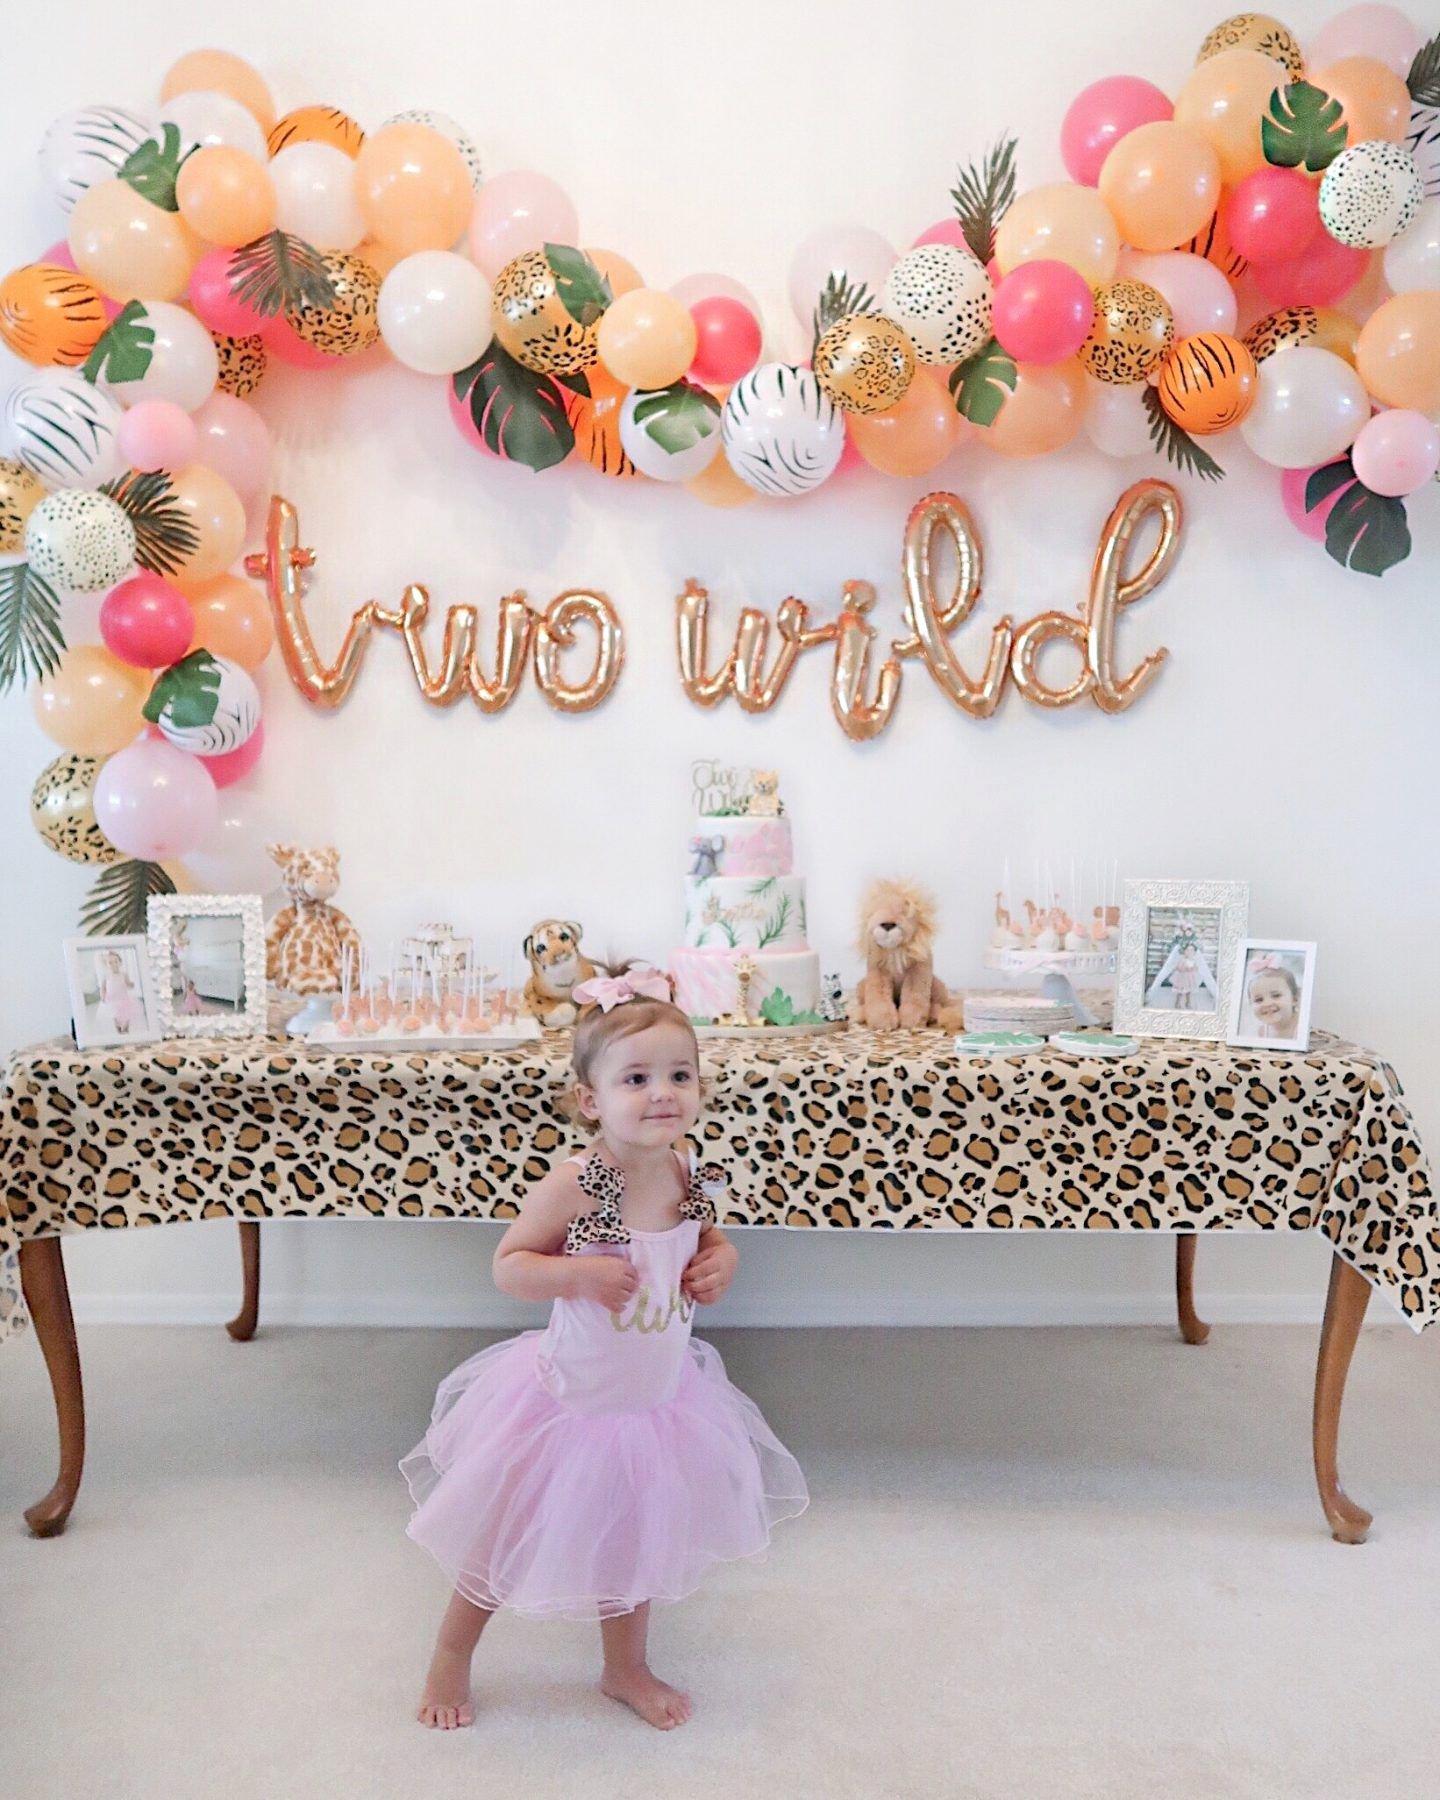 2nd Birthday Decoration Ideas at Home New Brie Bemis Rearick Safari Girl Birthday Party Summer